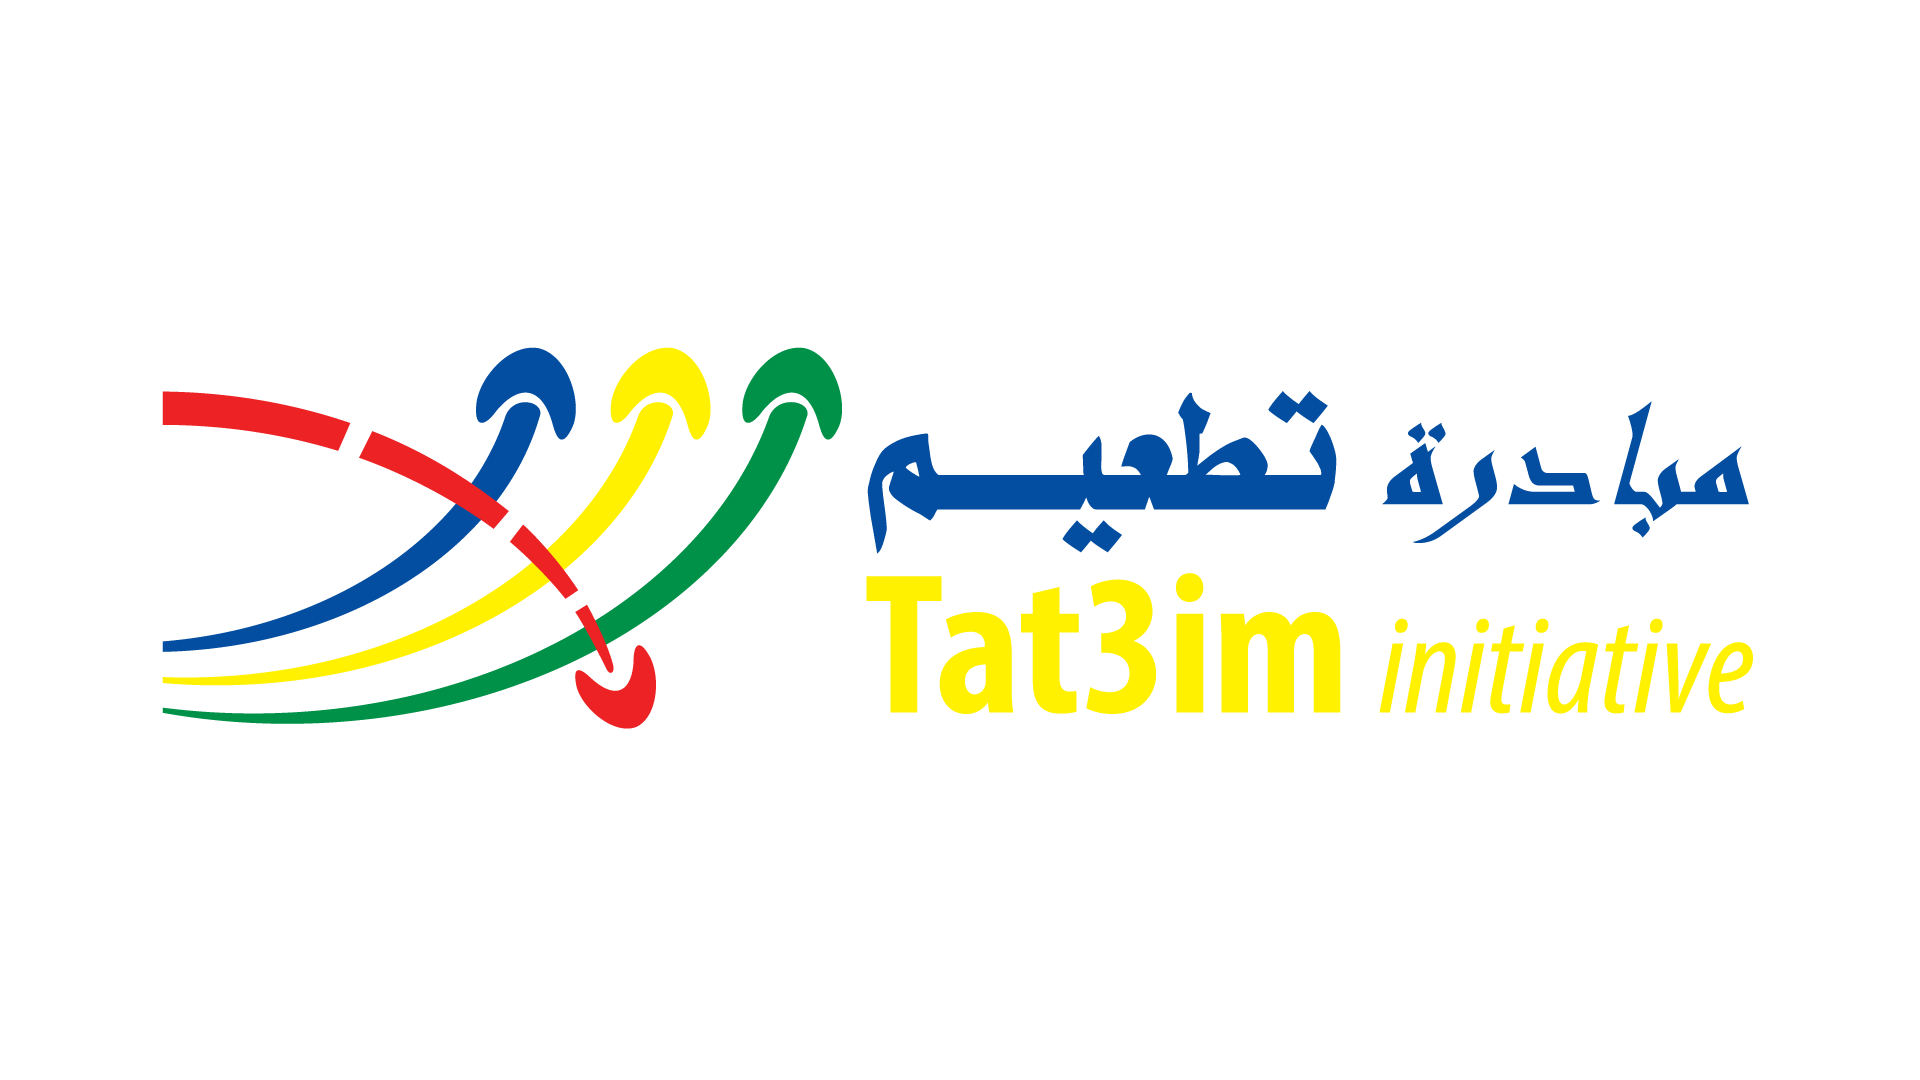 Tat3im